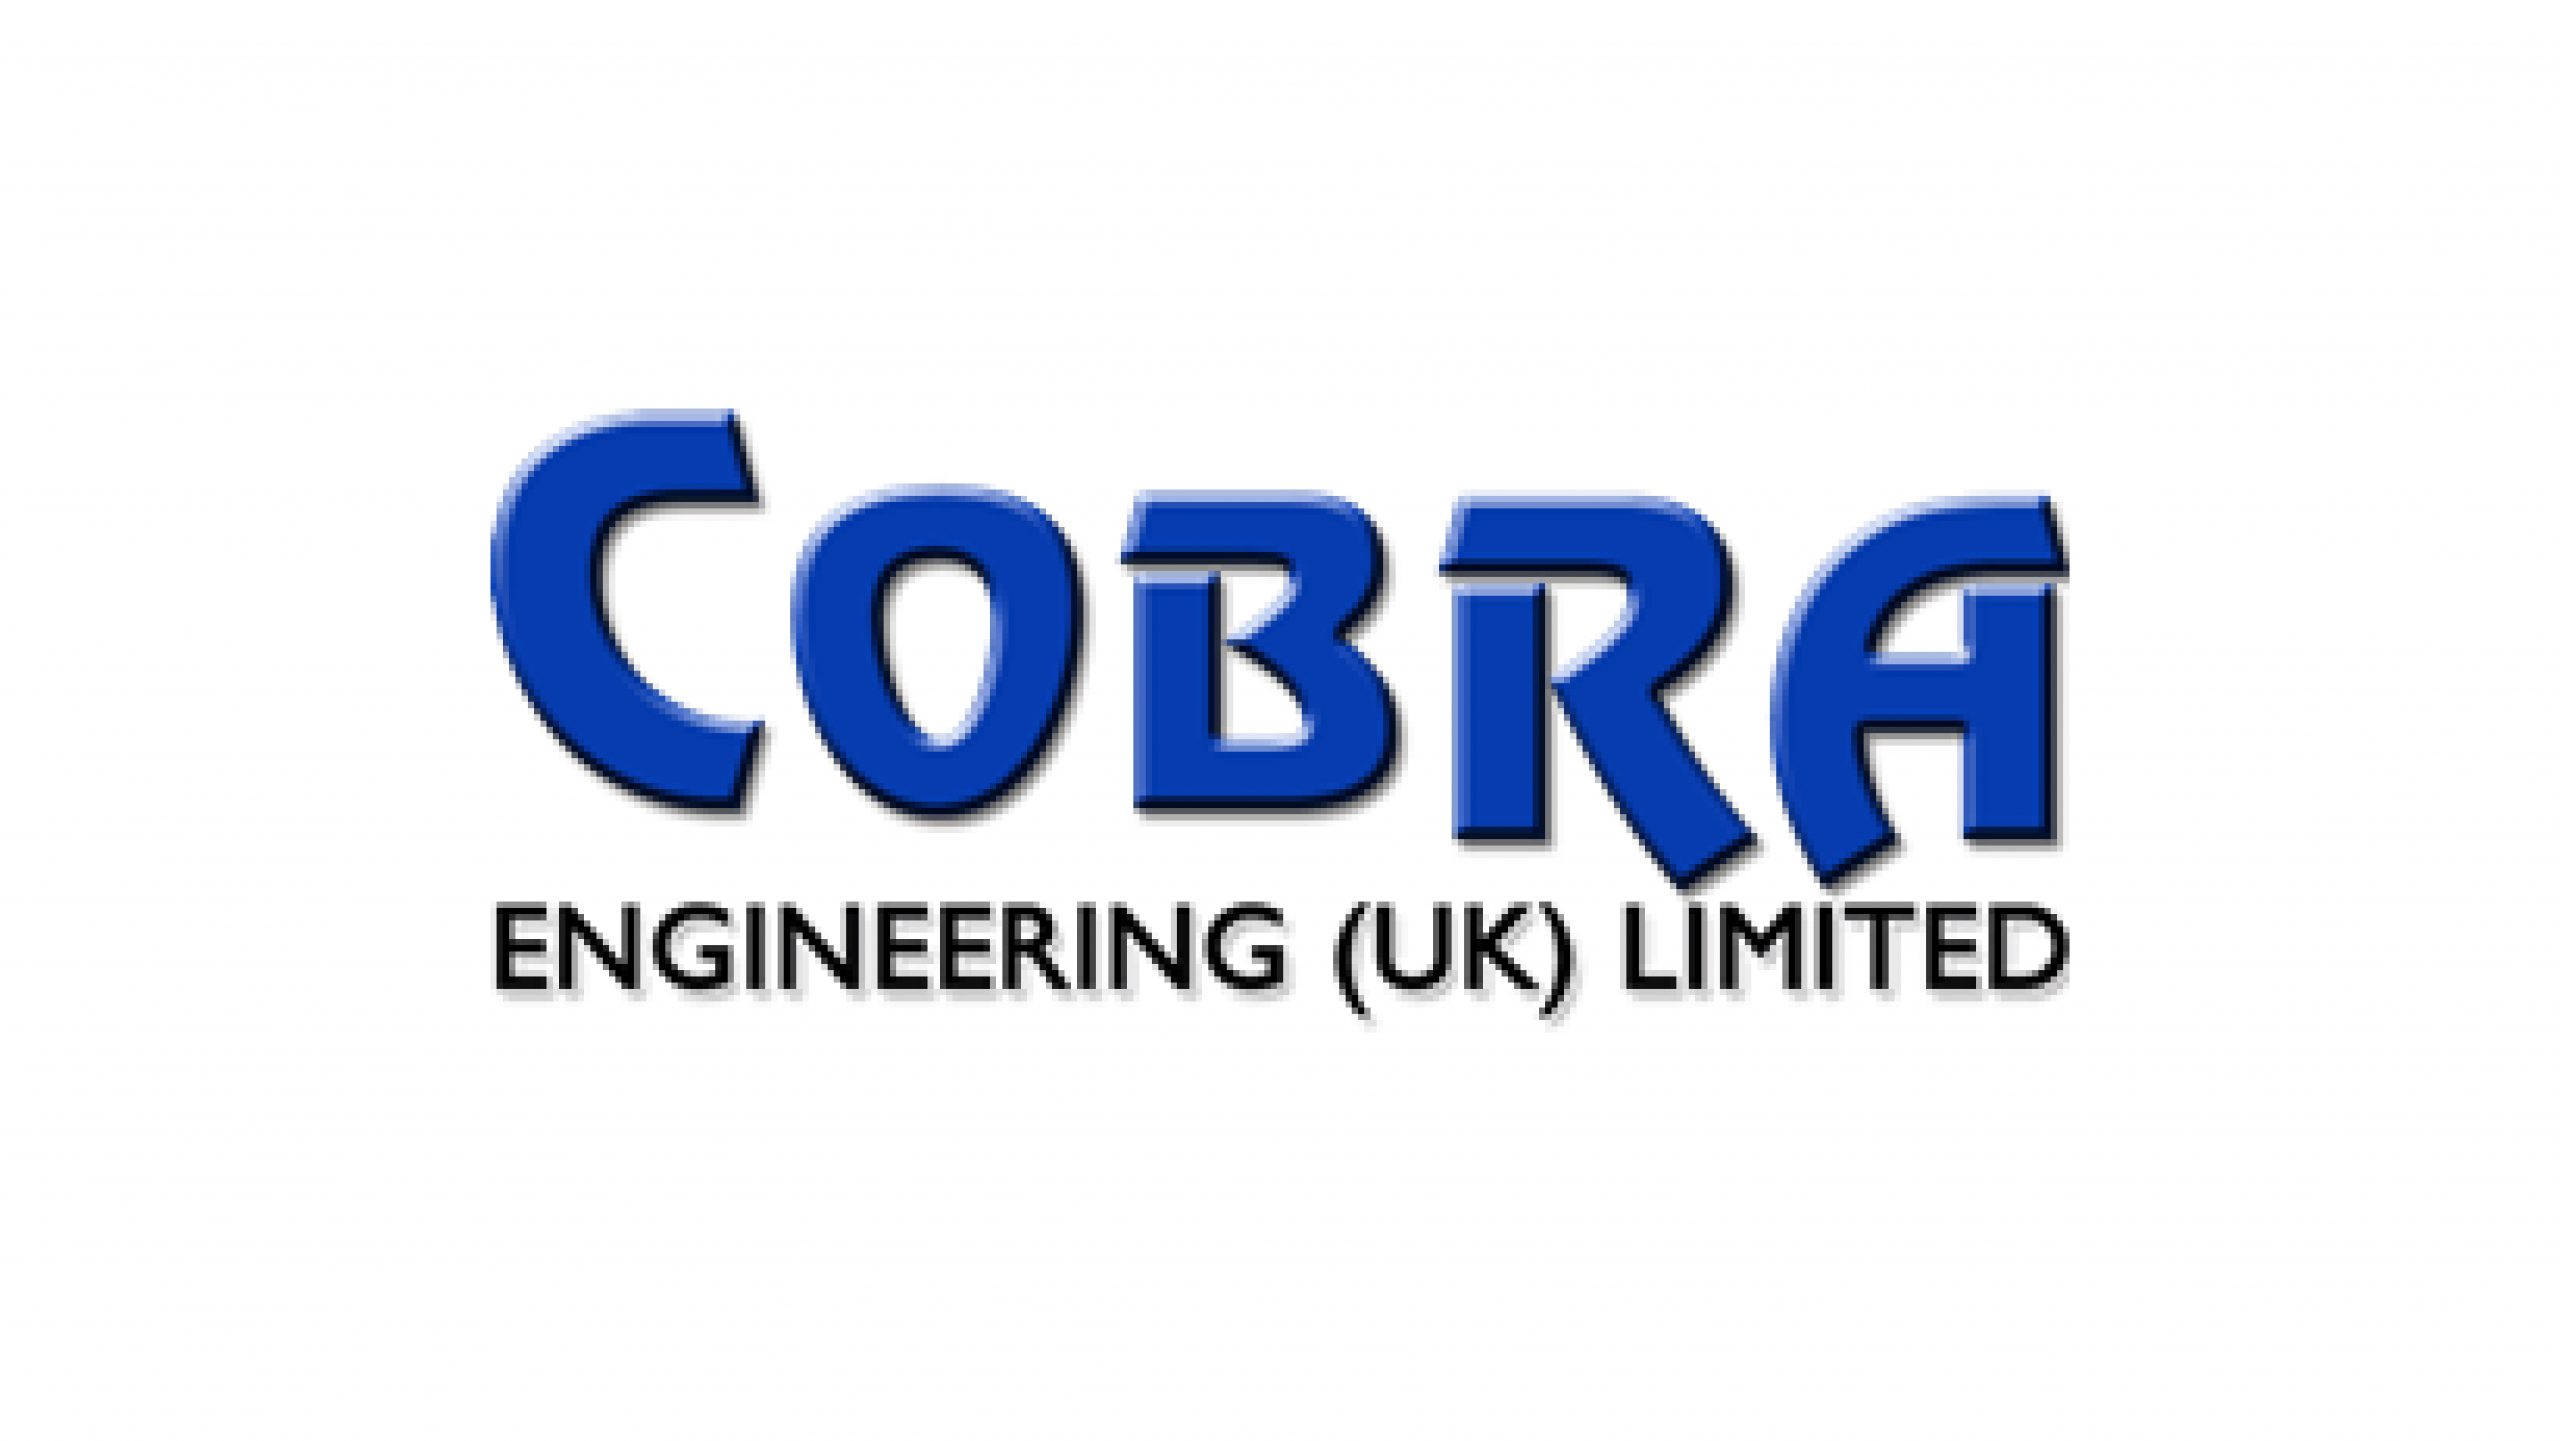 Cobra Engineering UK Limited